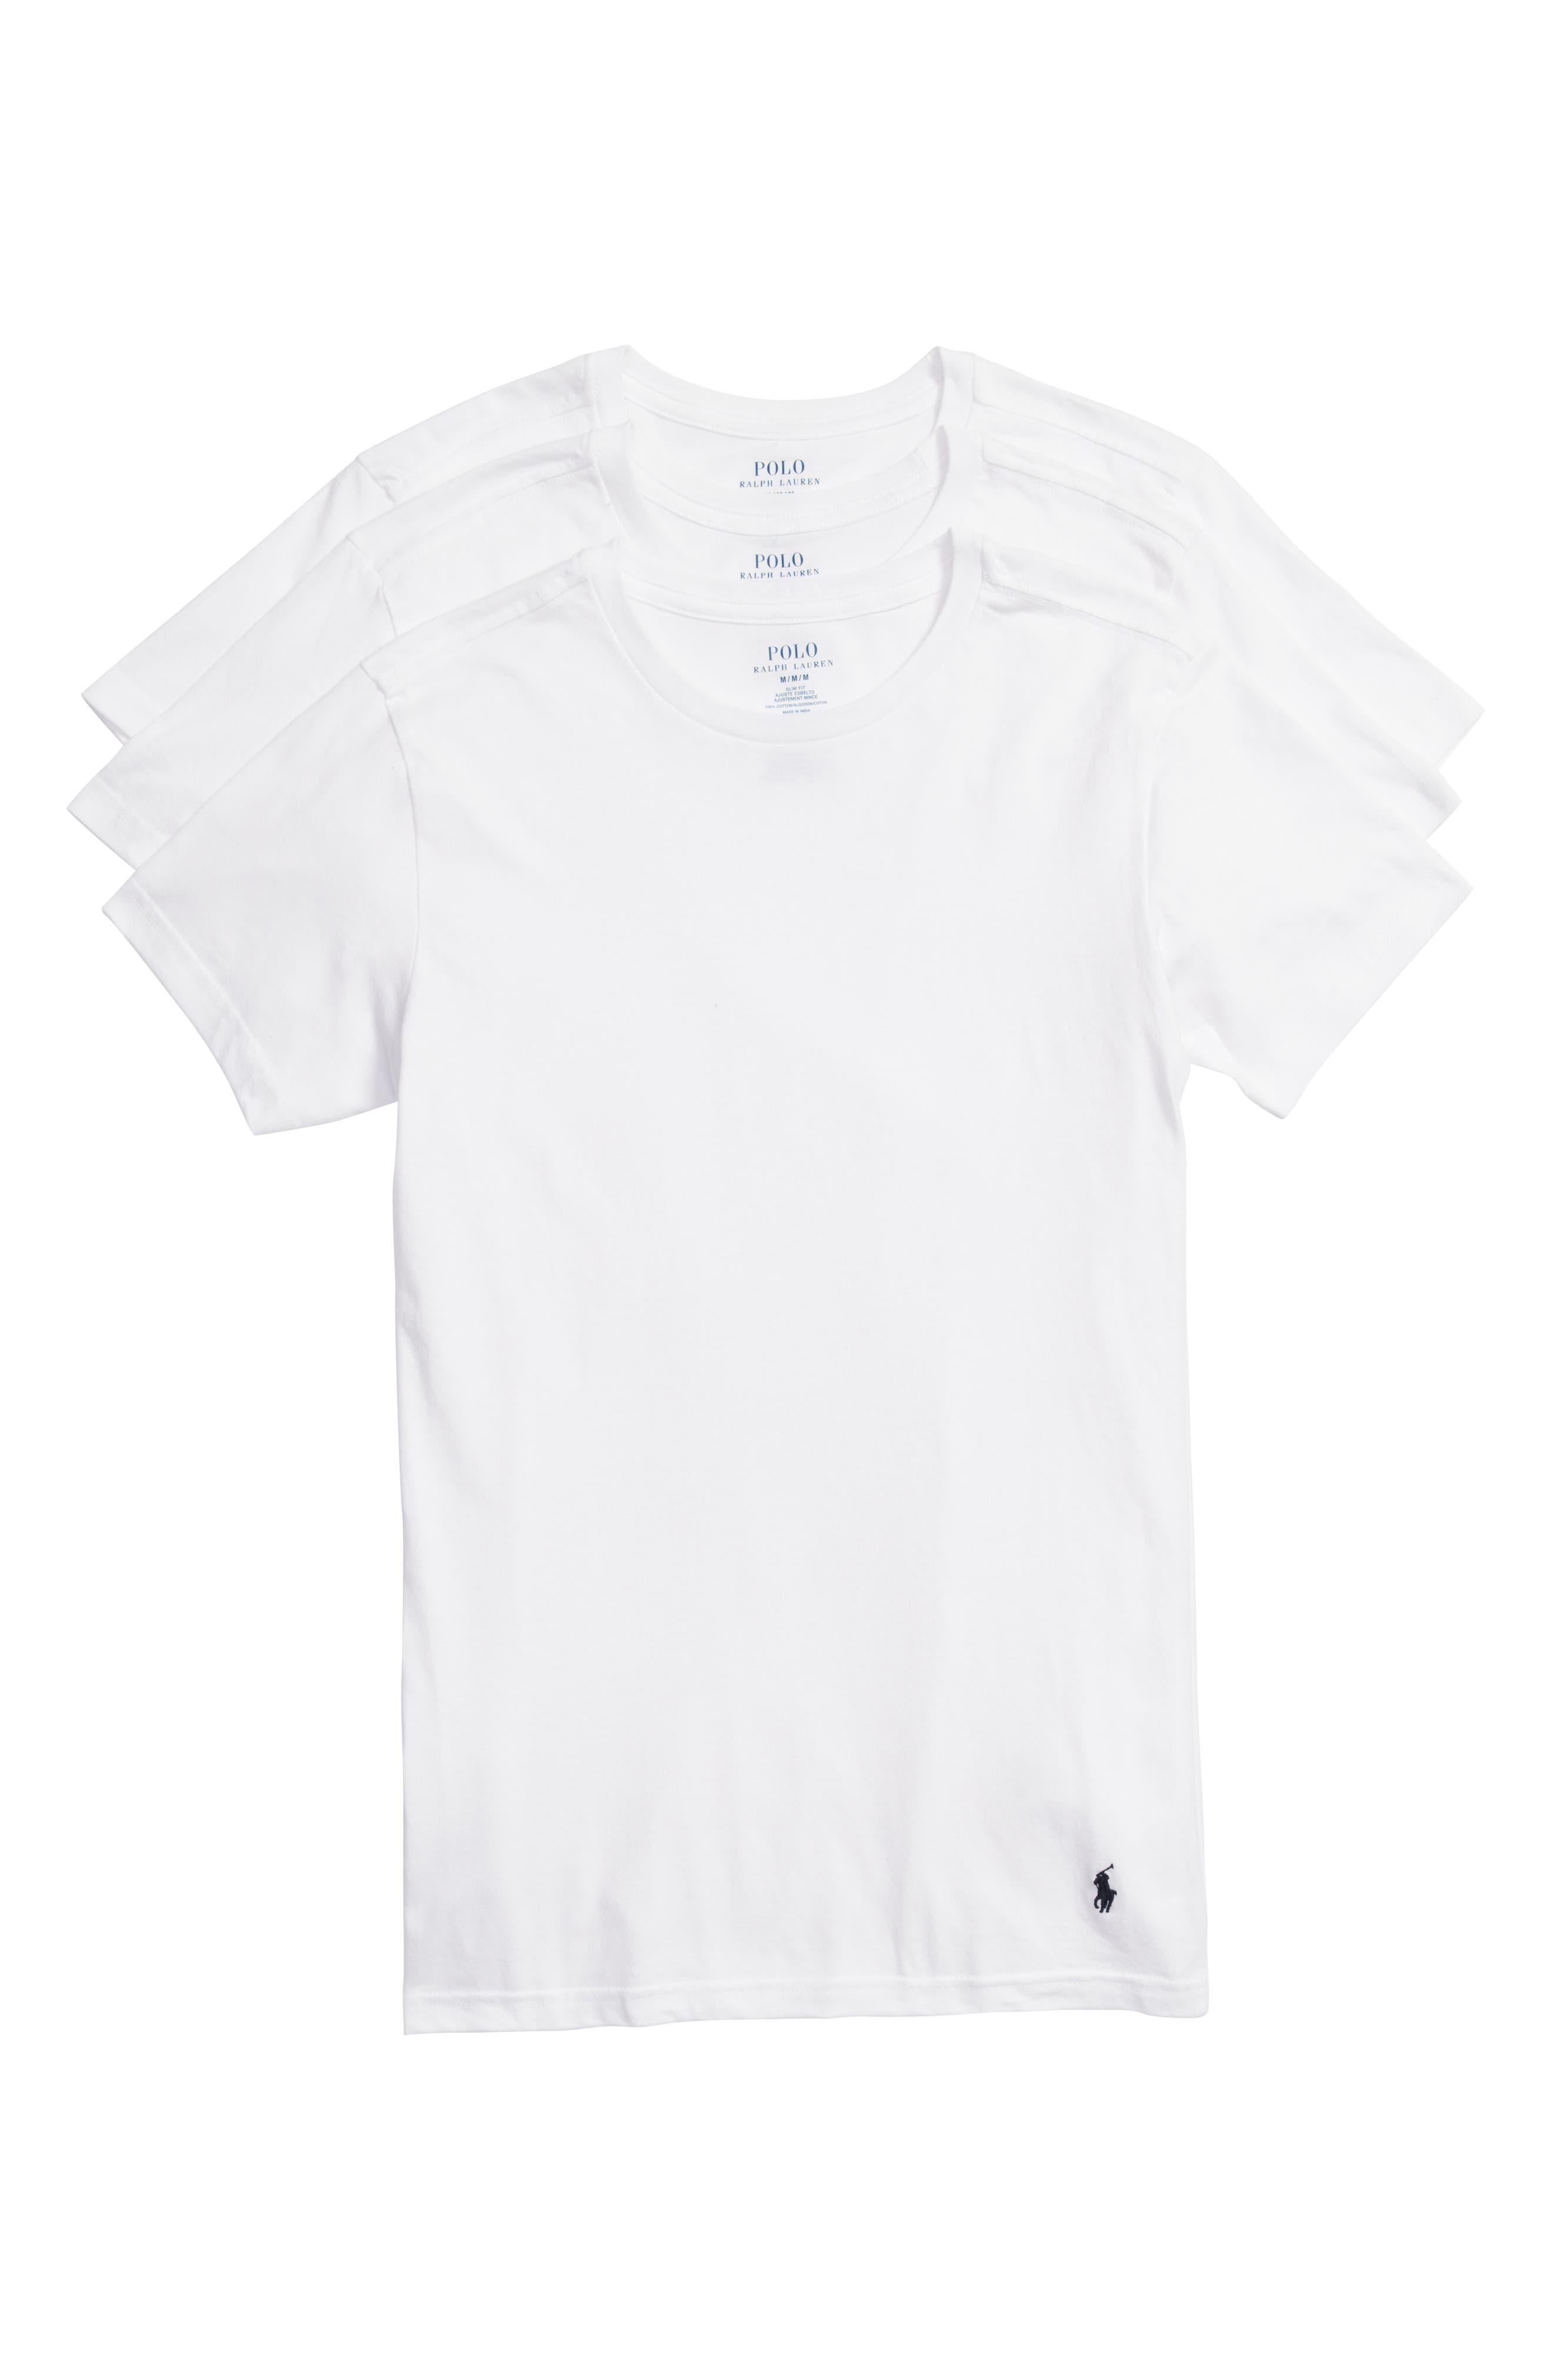 ralph lauren crew neck t shirt 3 pack